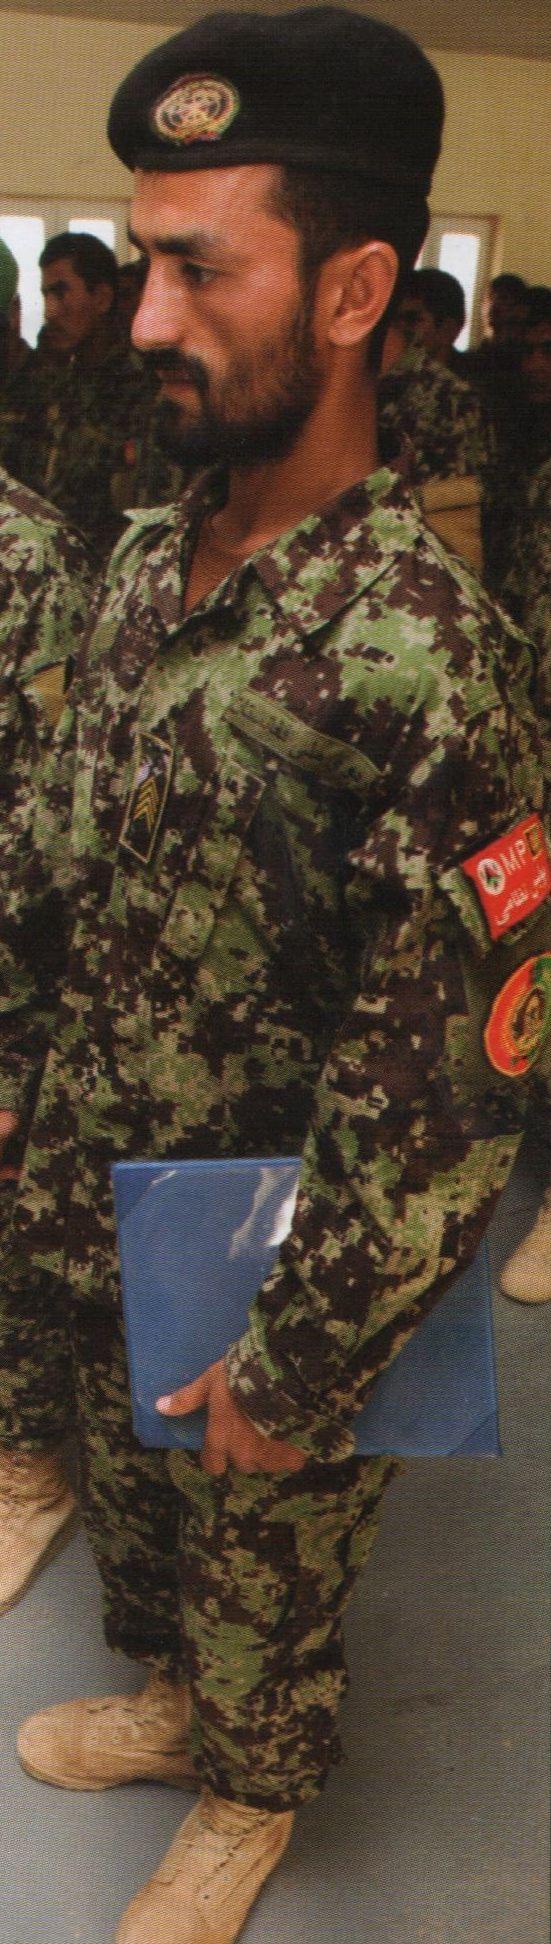 ANA Military Police Ana_mp10